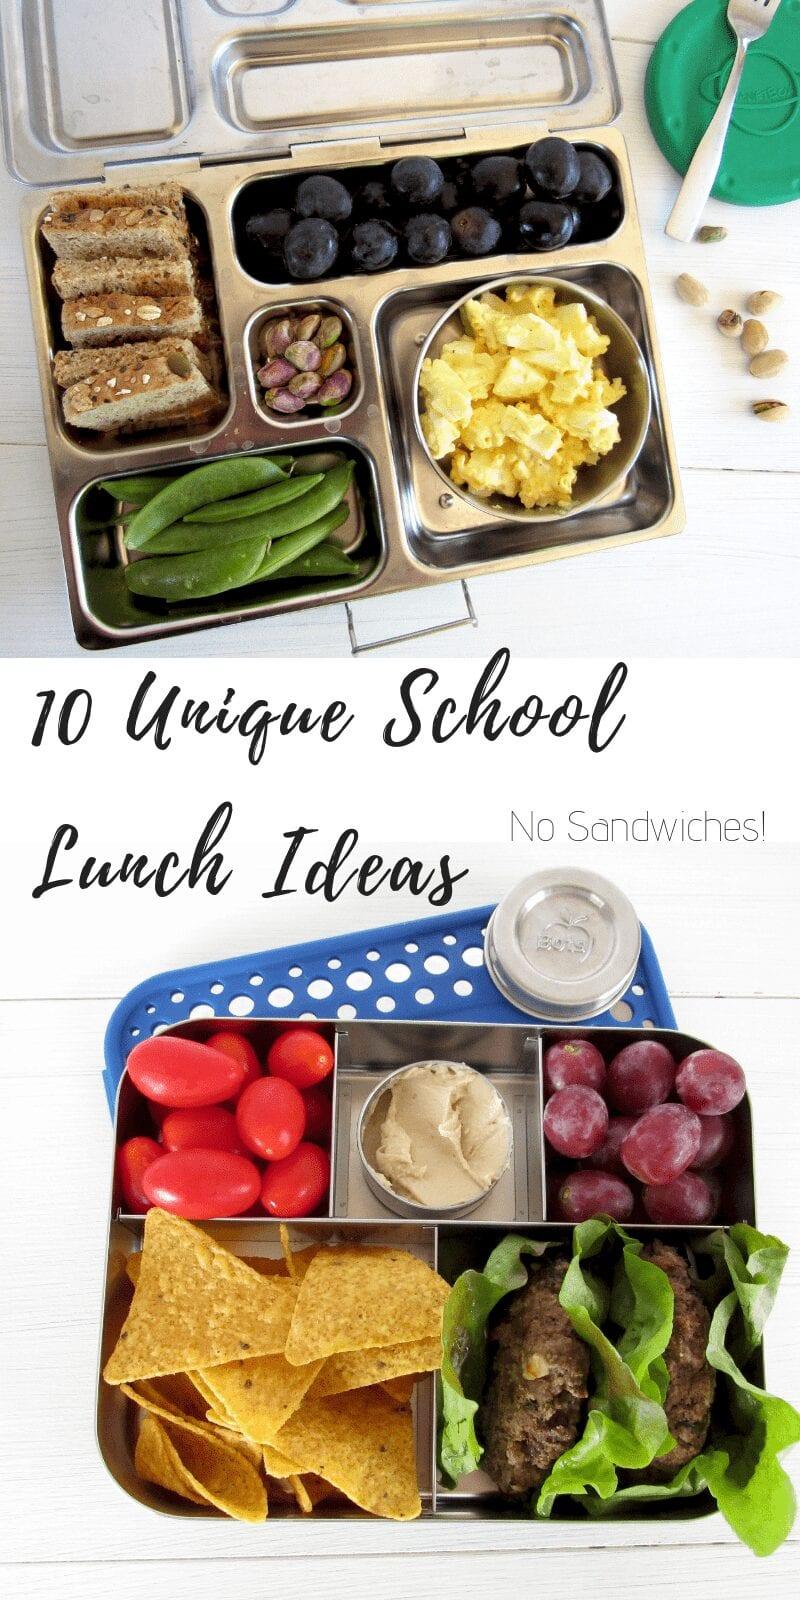 10 unique school lunch ideas no sandwiches #lunchbox #schoollunch #kidfood